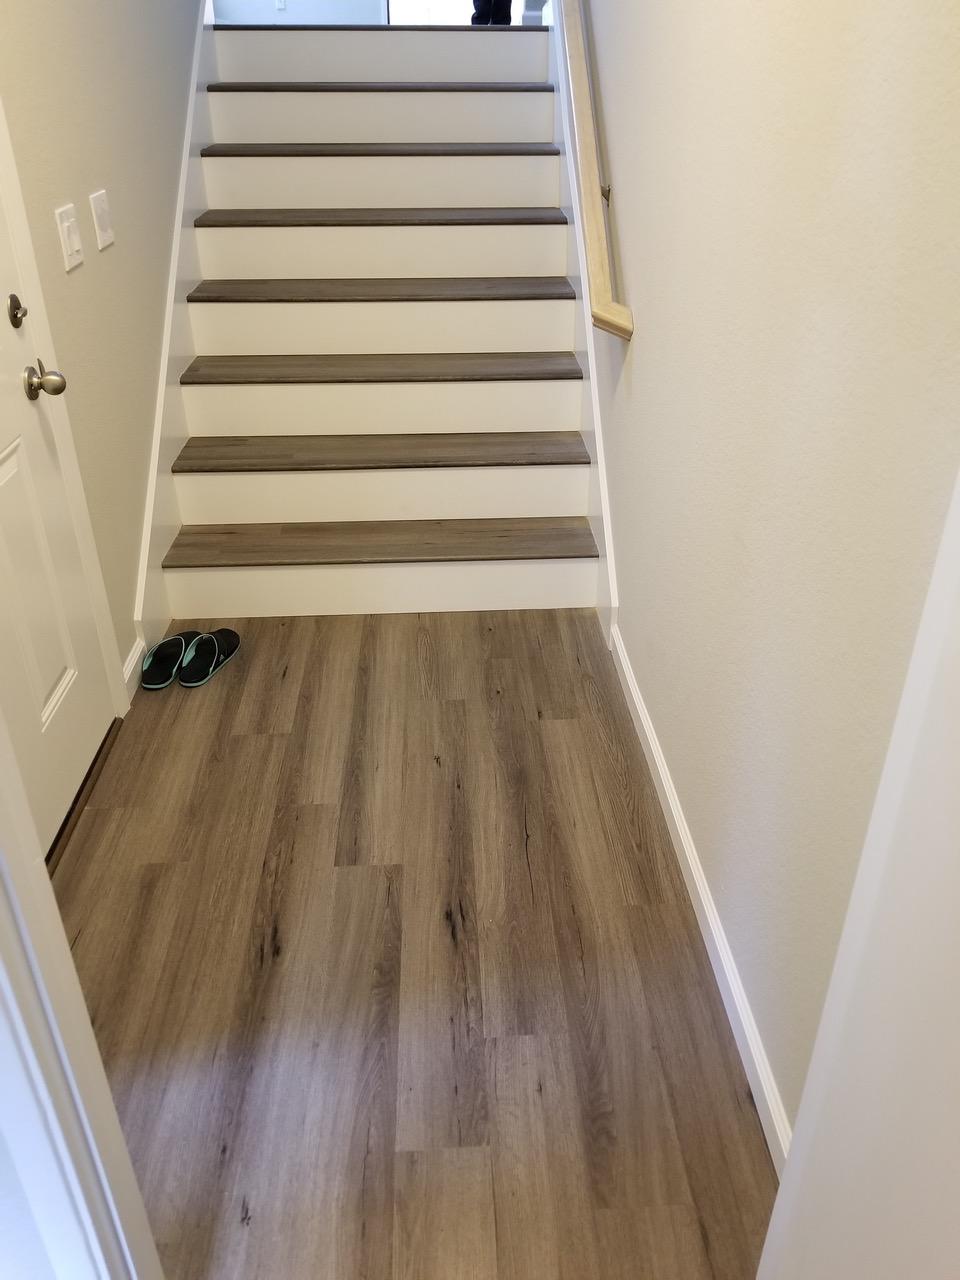 LVT Flooring Sales & Installation, Sunnyvale: Stairway Landing.